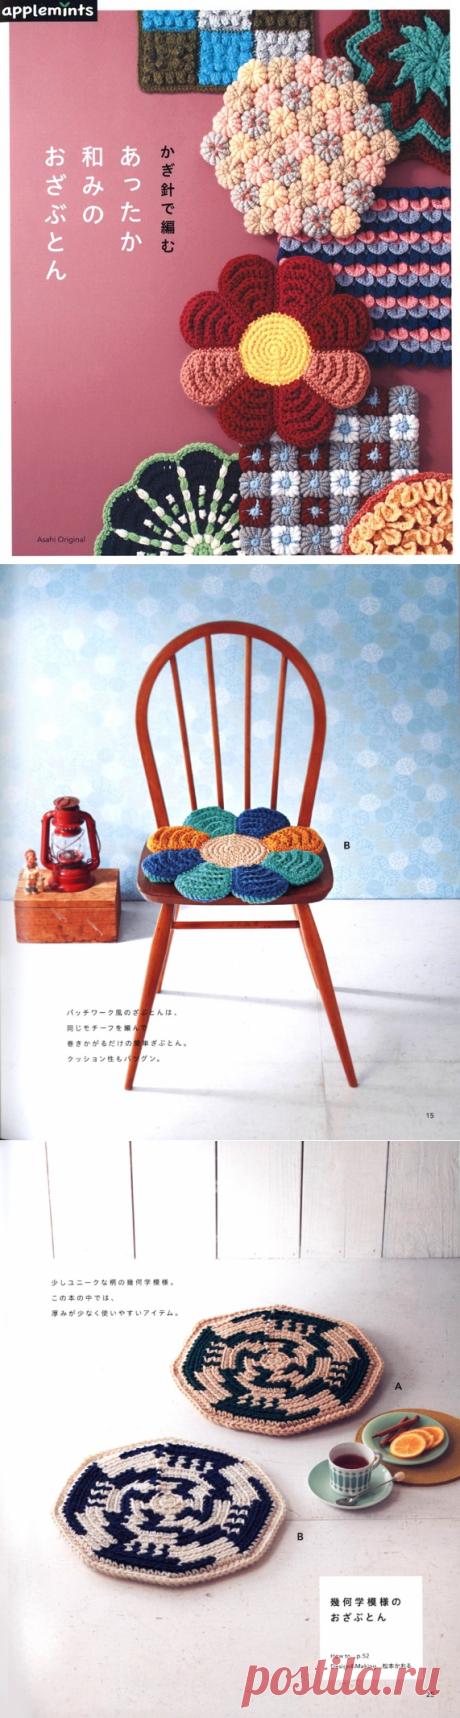 Asahi Original - Warm & Soft Crochet 2019